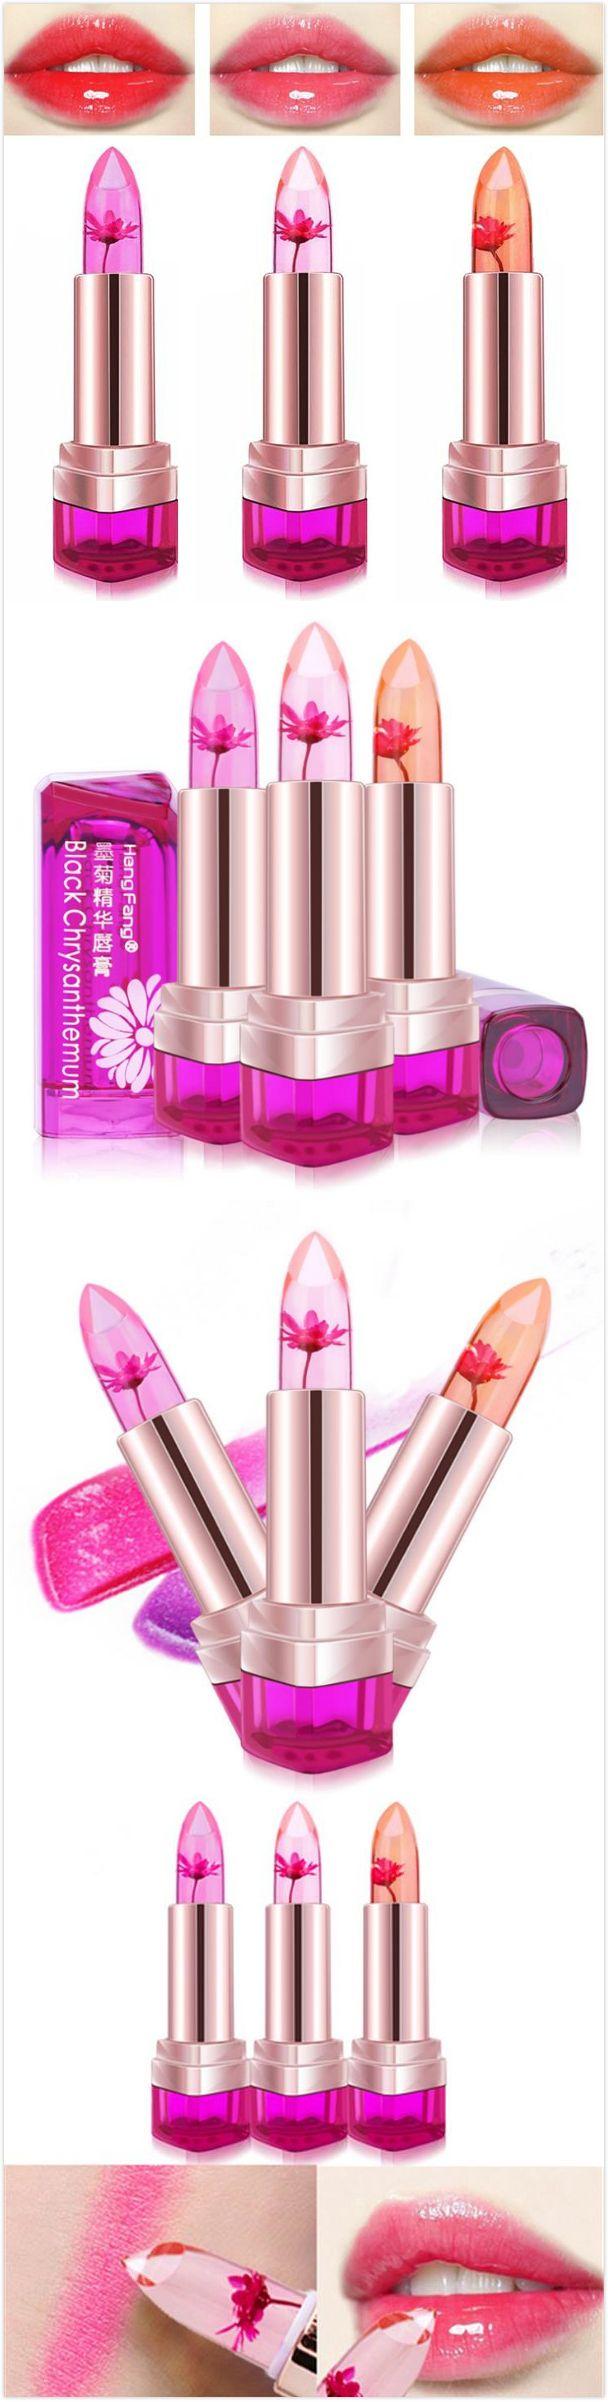 [$ 6.66]  3 Colors Jelly Flower Temperature Change Lipstick Lip Gloss Balm Moisturizing No Fade Nonstick